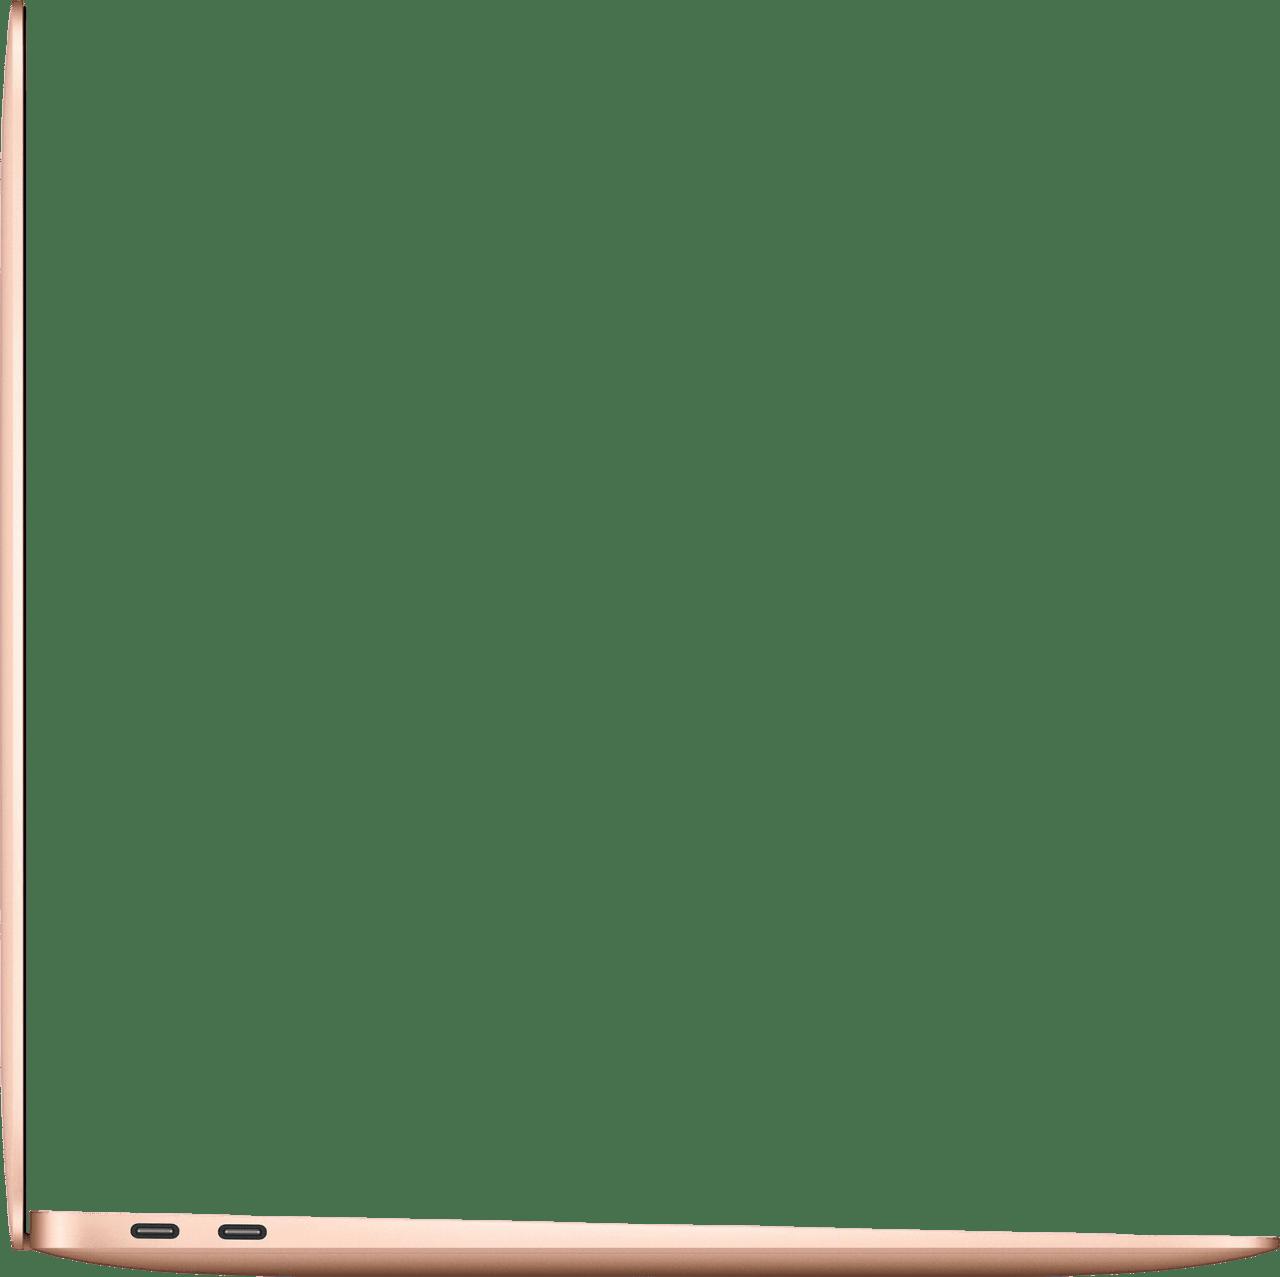 Gold Apple MacBook Air (Late 2020) Laptop - Apple M1 - 8GB - 256GB SSD - Apple Integrated 7-core GPU.3